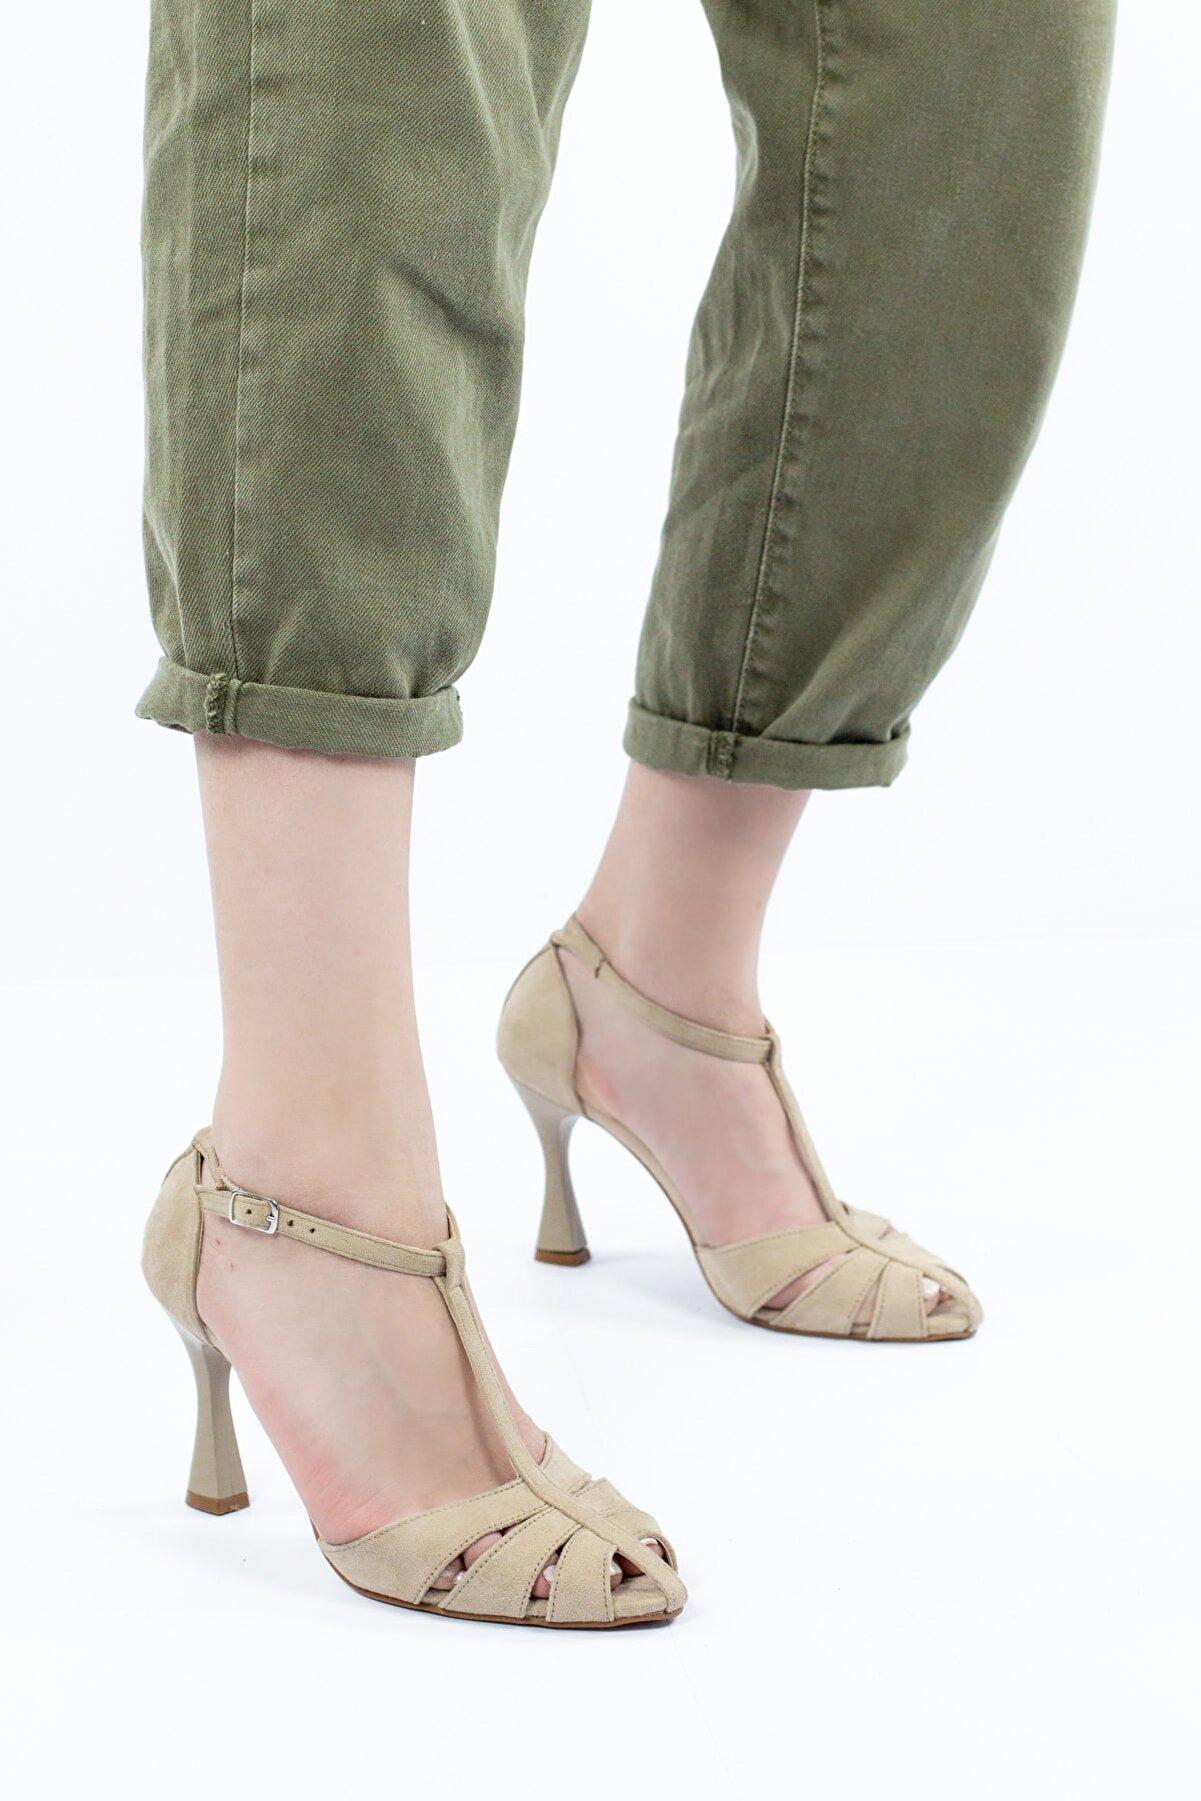 Gökhan Talay Princess Kadın Klasik Topuklu Ayakkabı